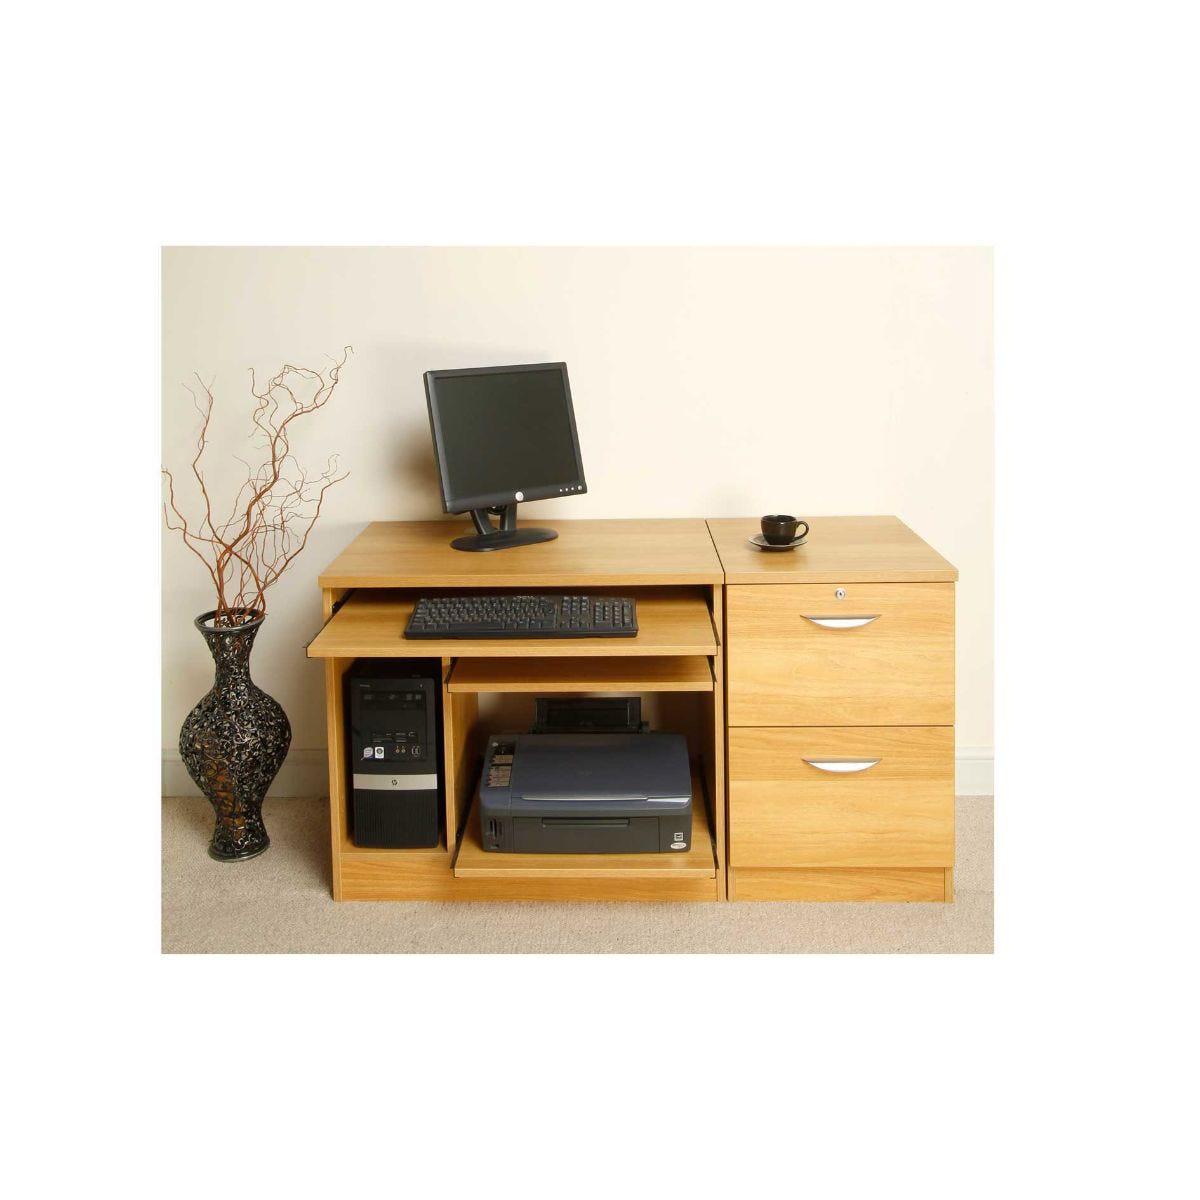 R White Lawrence Desk Workstation, Classic Oak